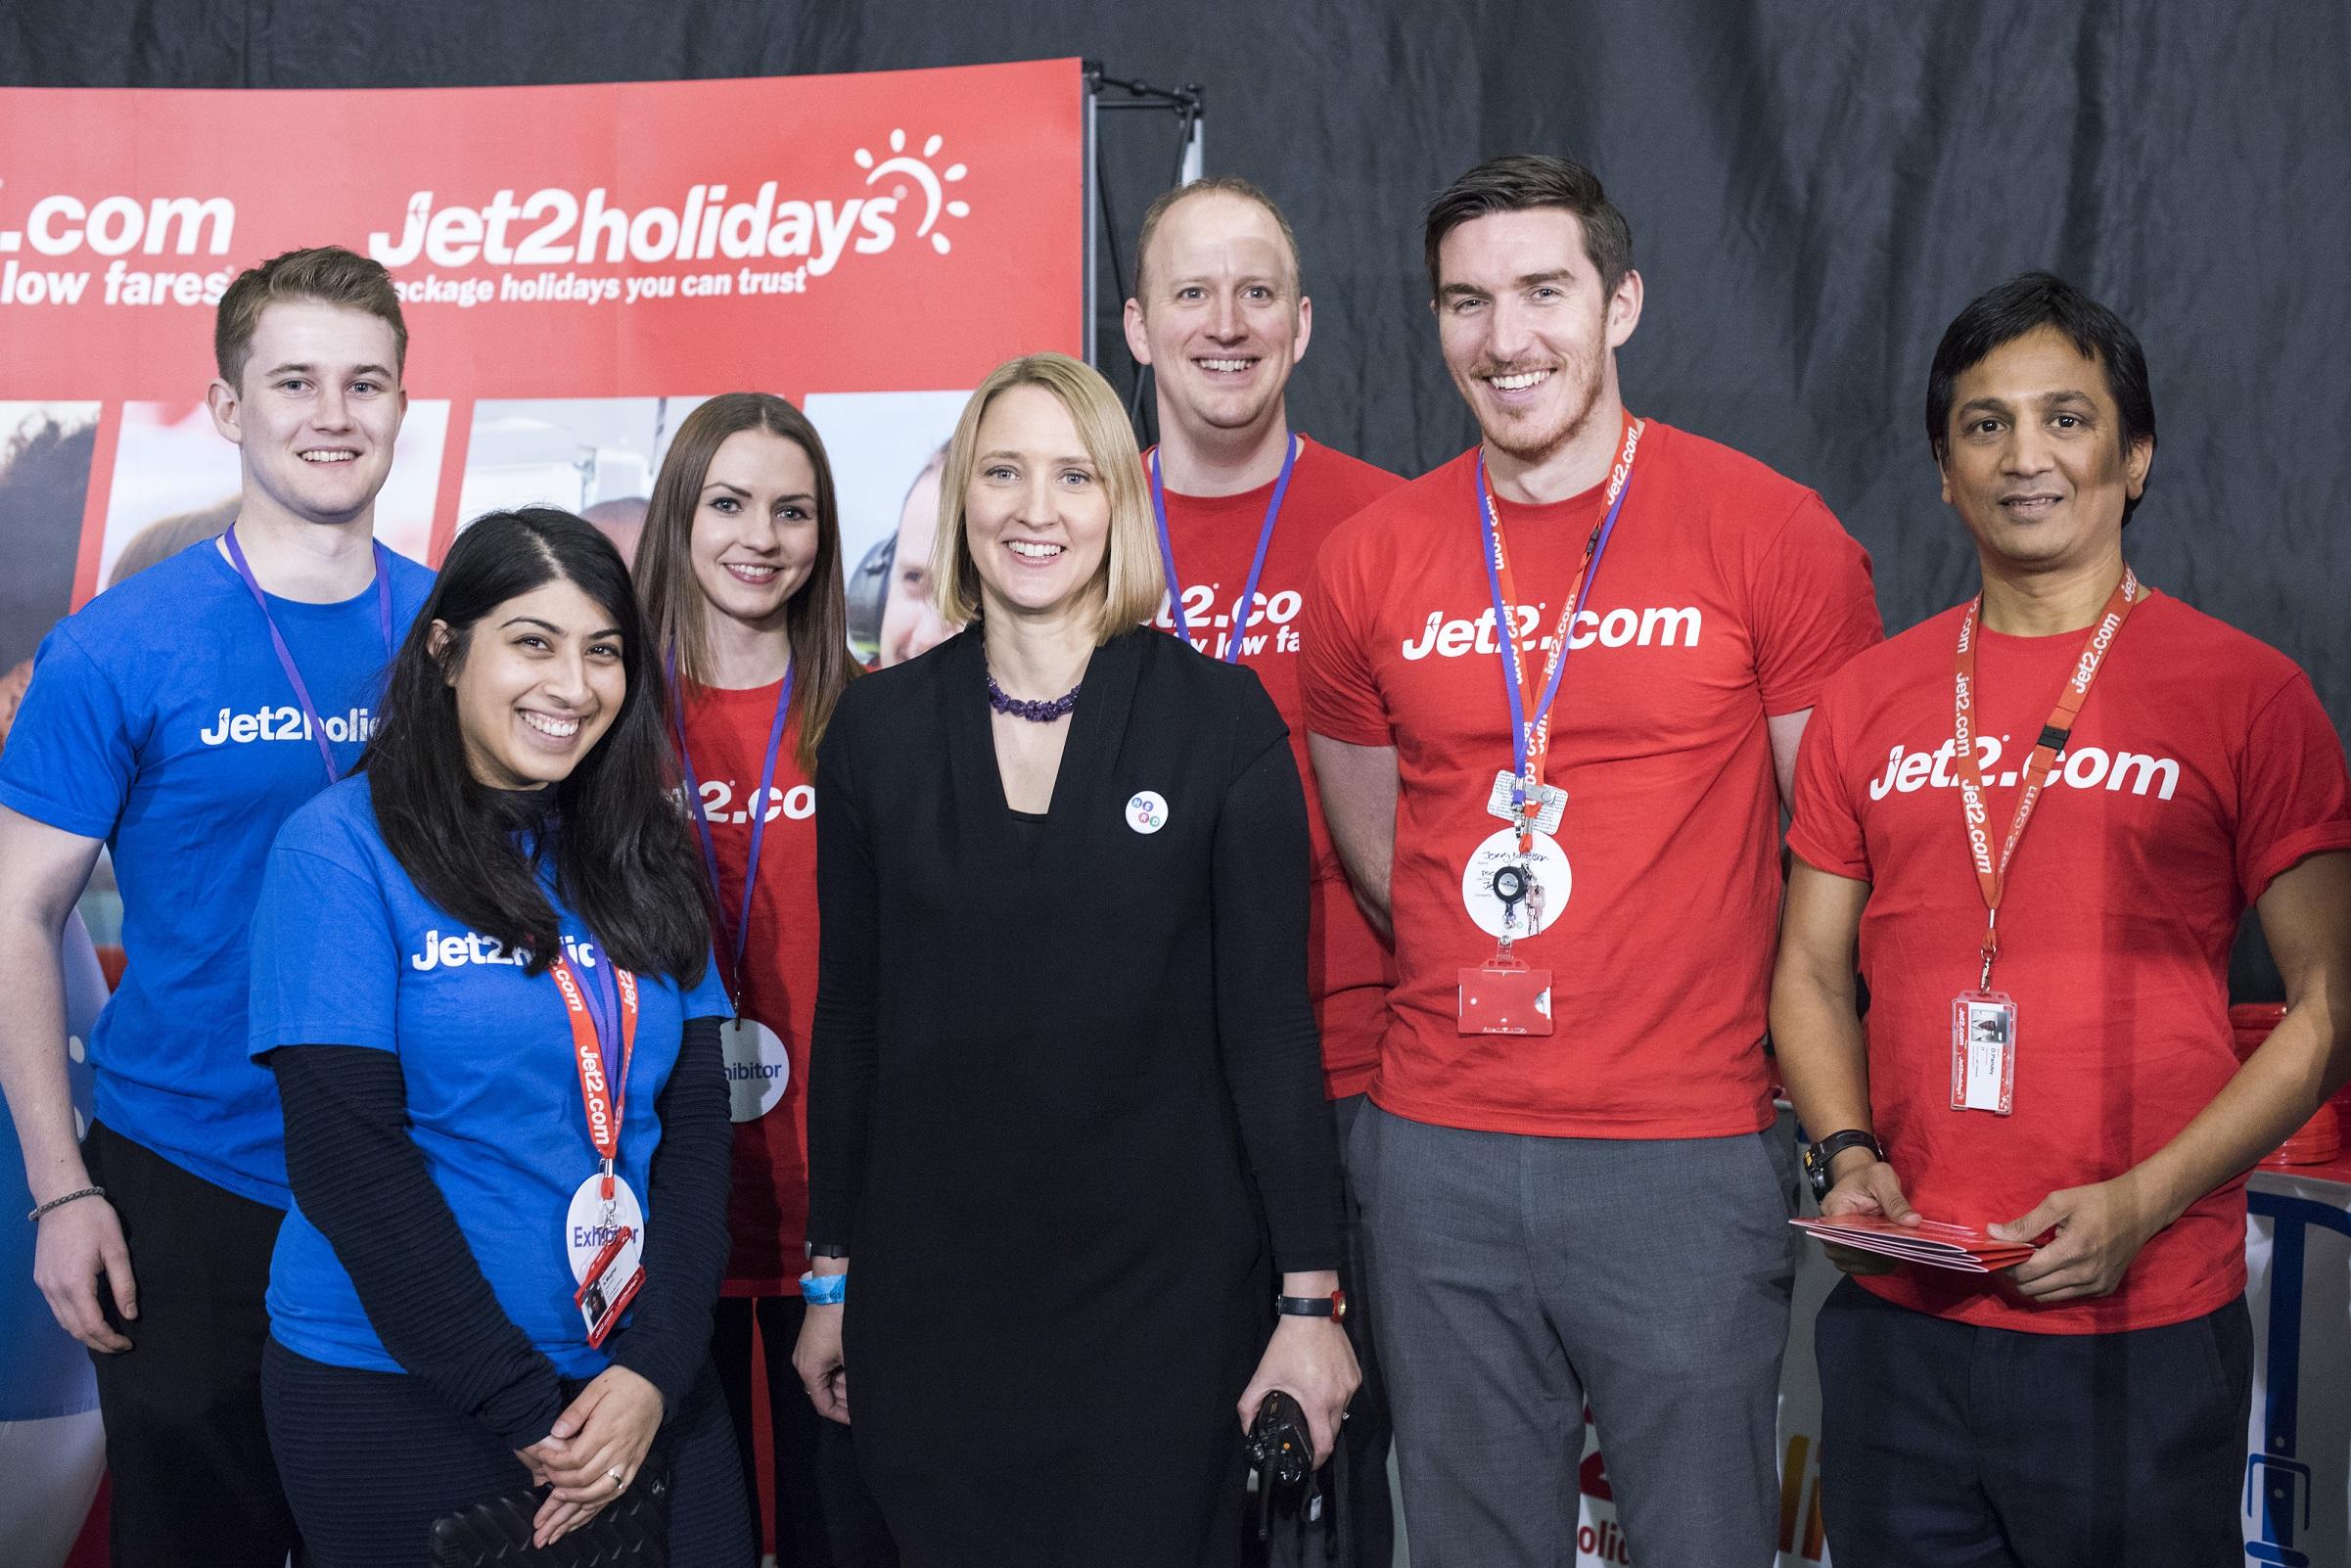 Herd's Amy De-Balsi with the Jet2.com and Jetholidays team at Leeds Digital Job Fair 3.0